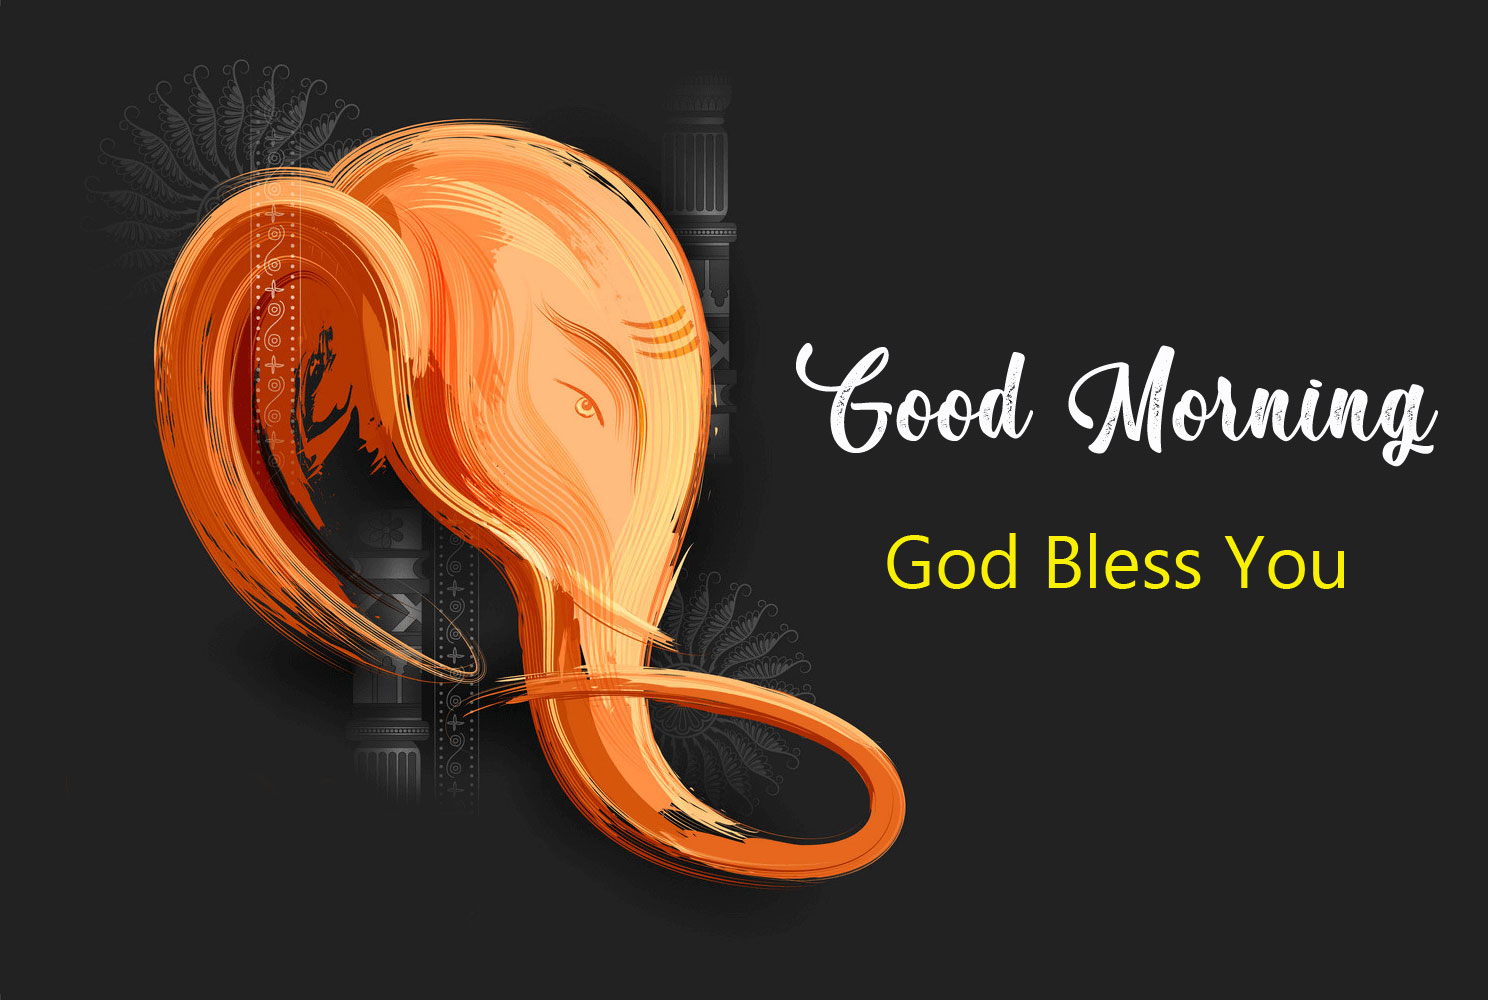 ganesha good morning images free hd download